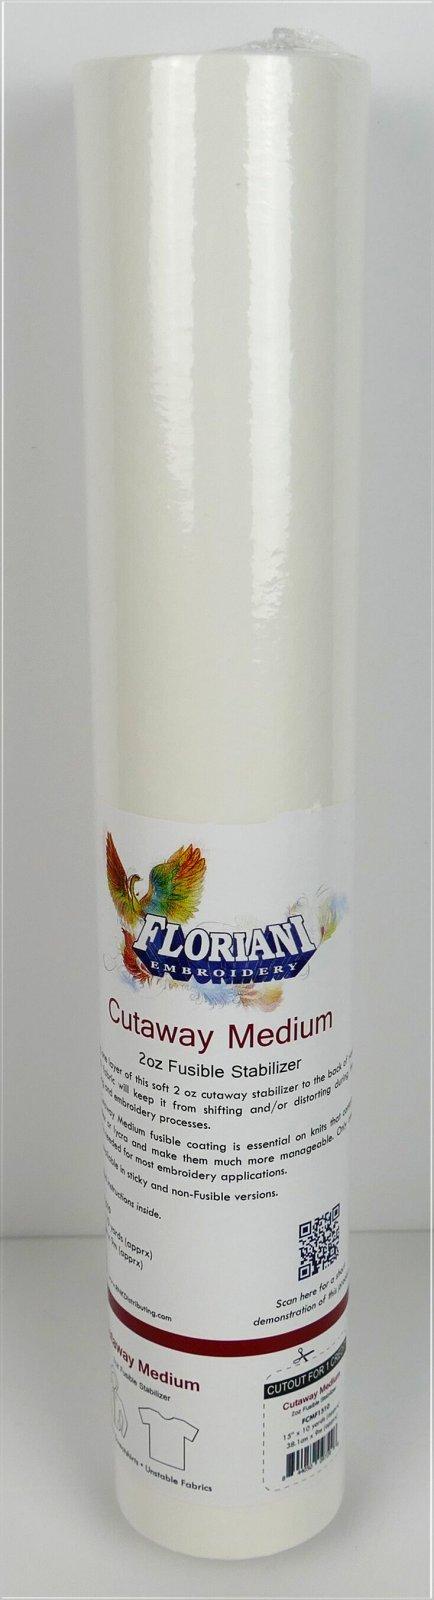 Floriani Cutaway Medium Fusible Stabilizer